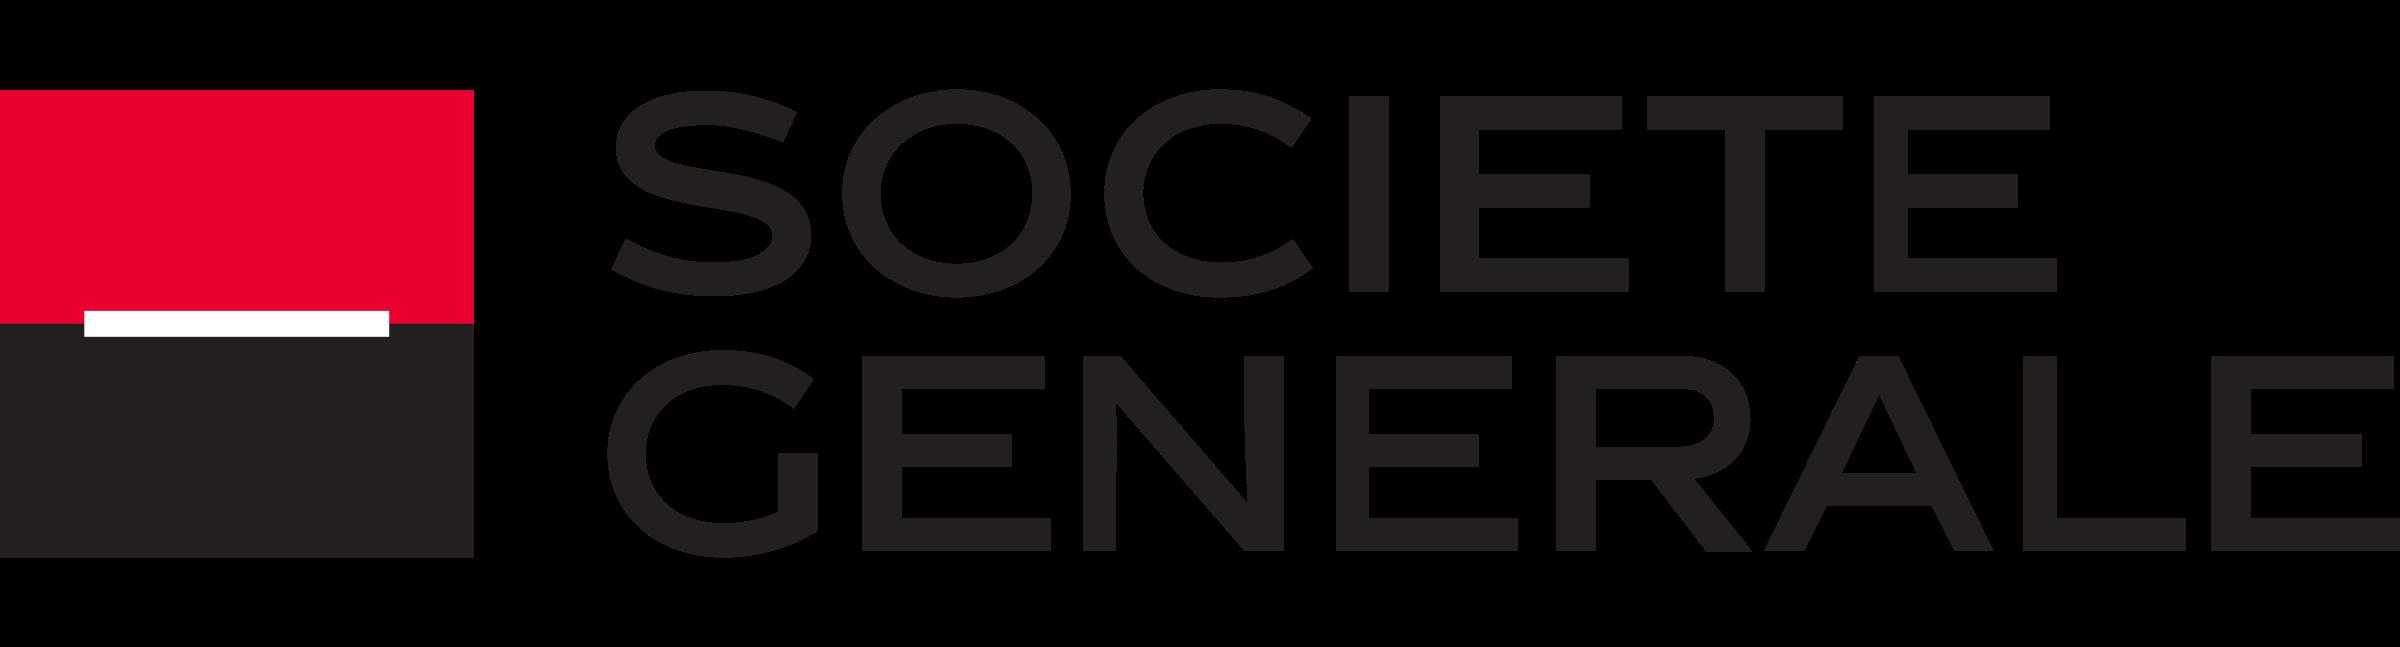 societe-generale-2-logo-png-transparent